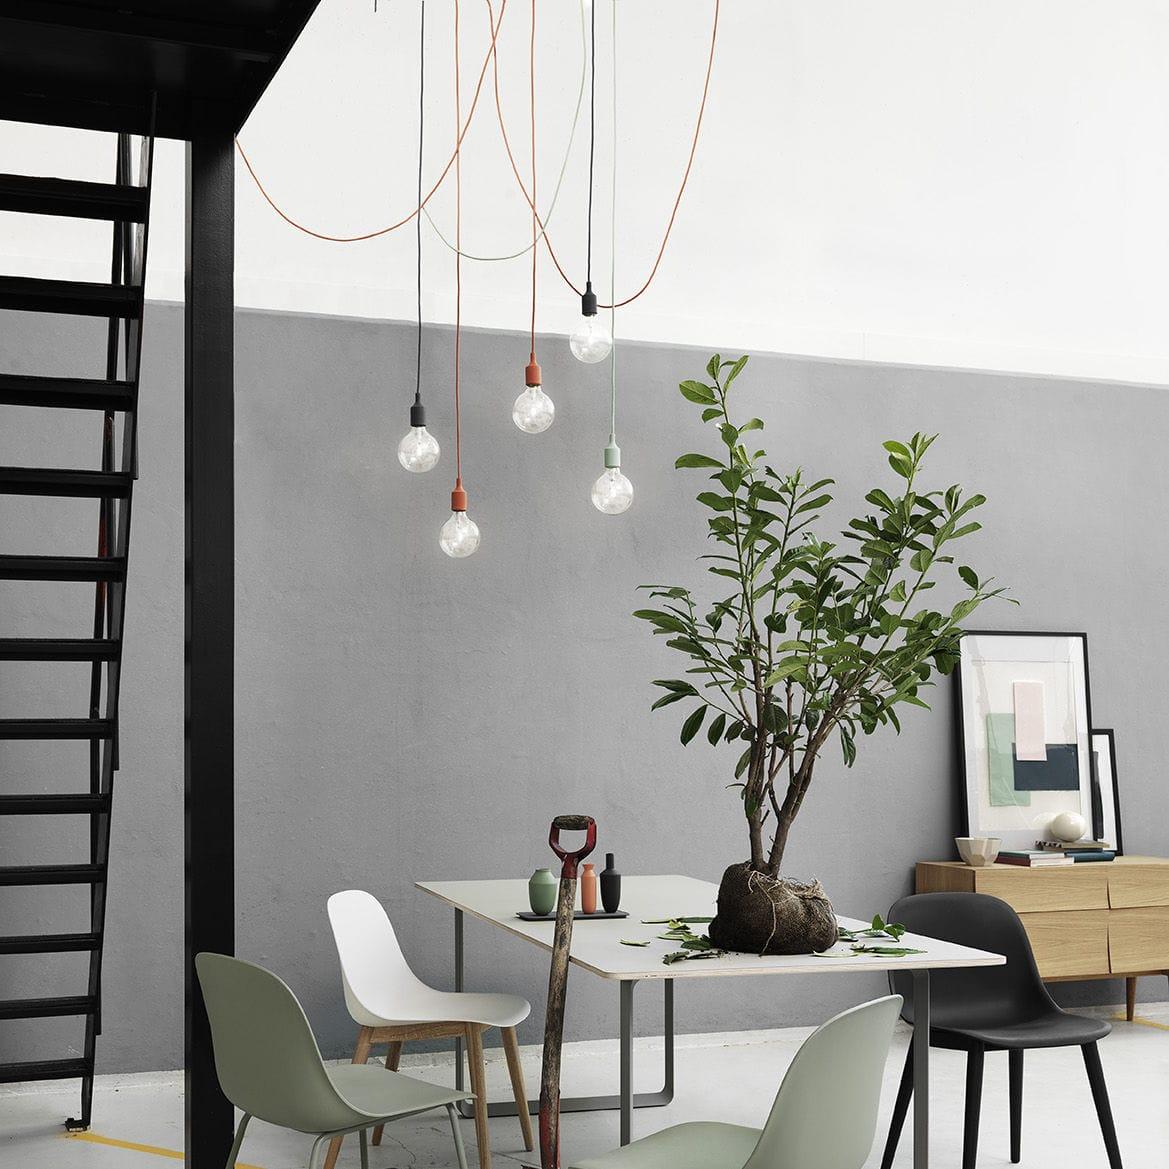 Elegant Lampe Industriedesign Beste Wahl Hängelampe / / Pvc / Aus Silikonhaltigem